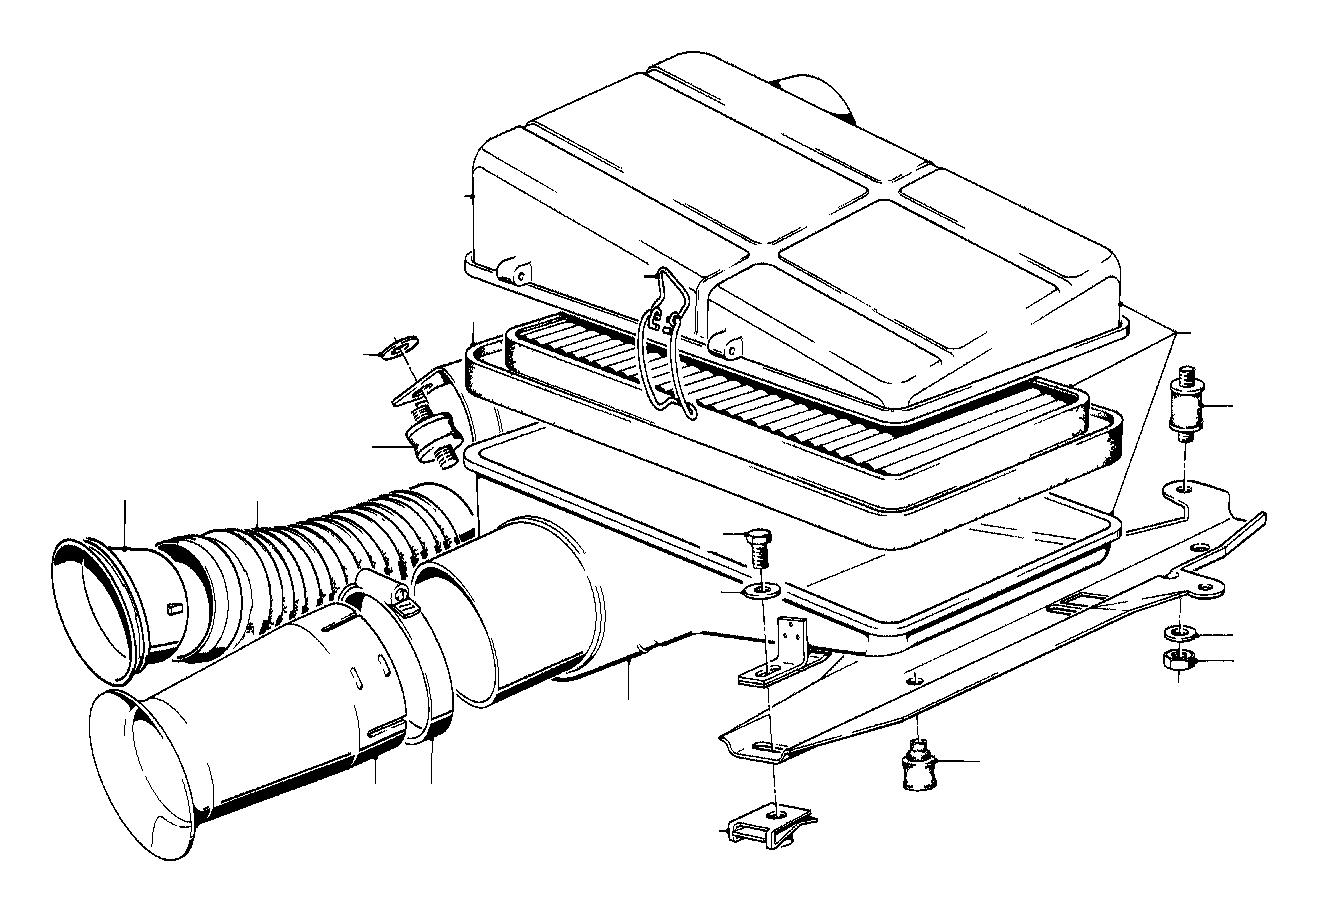 Bmw 735i Intake Tube Silencer Fuel Filter